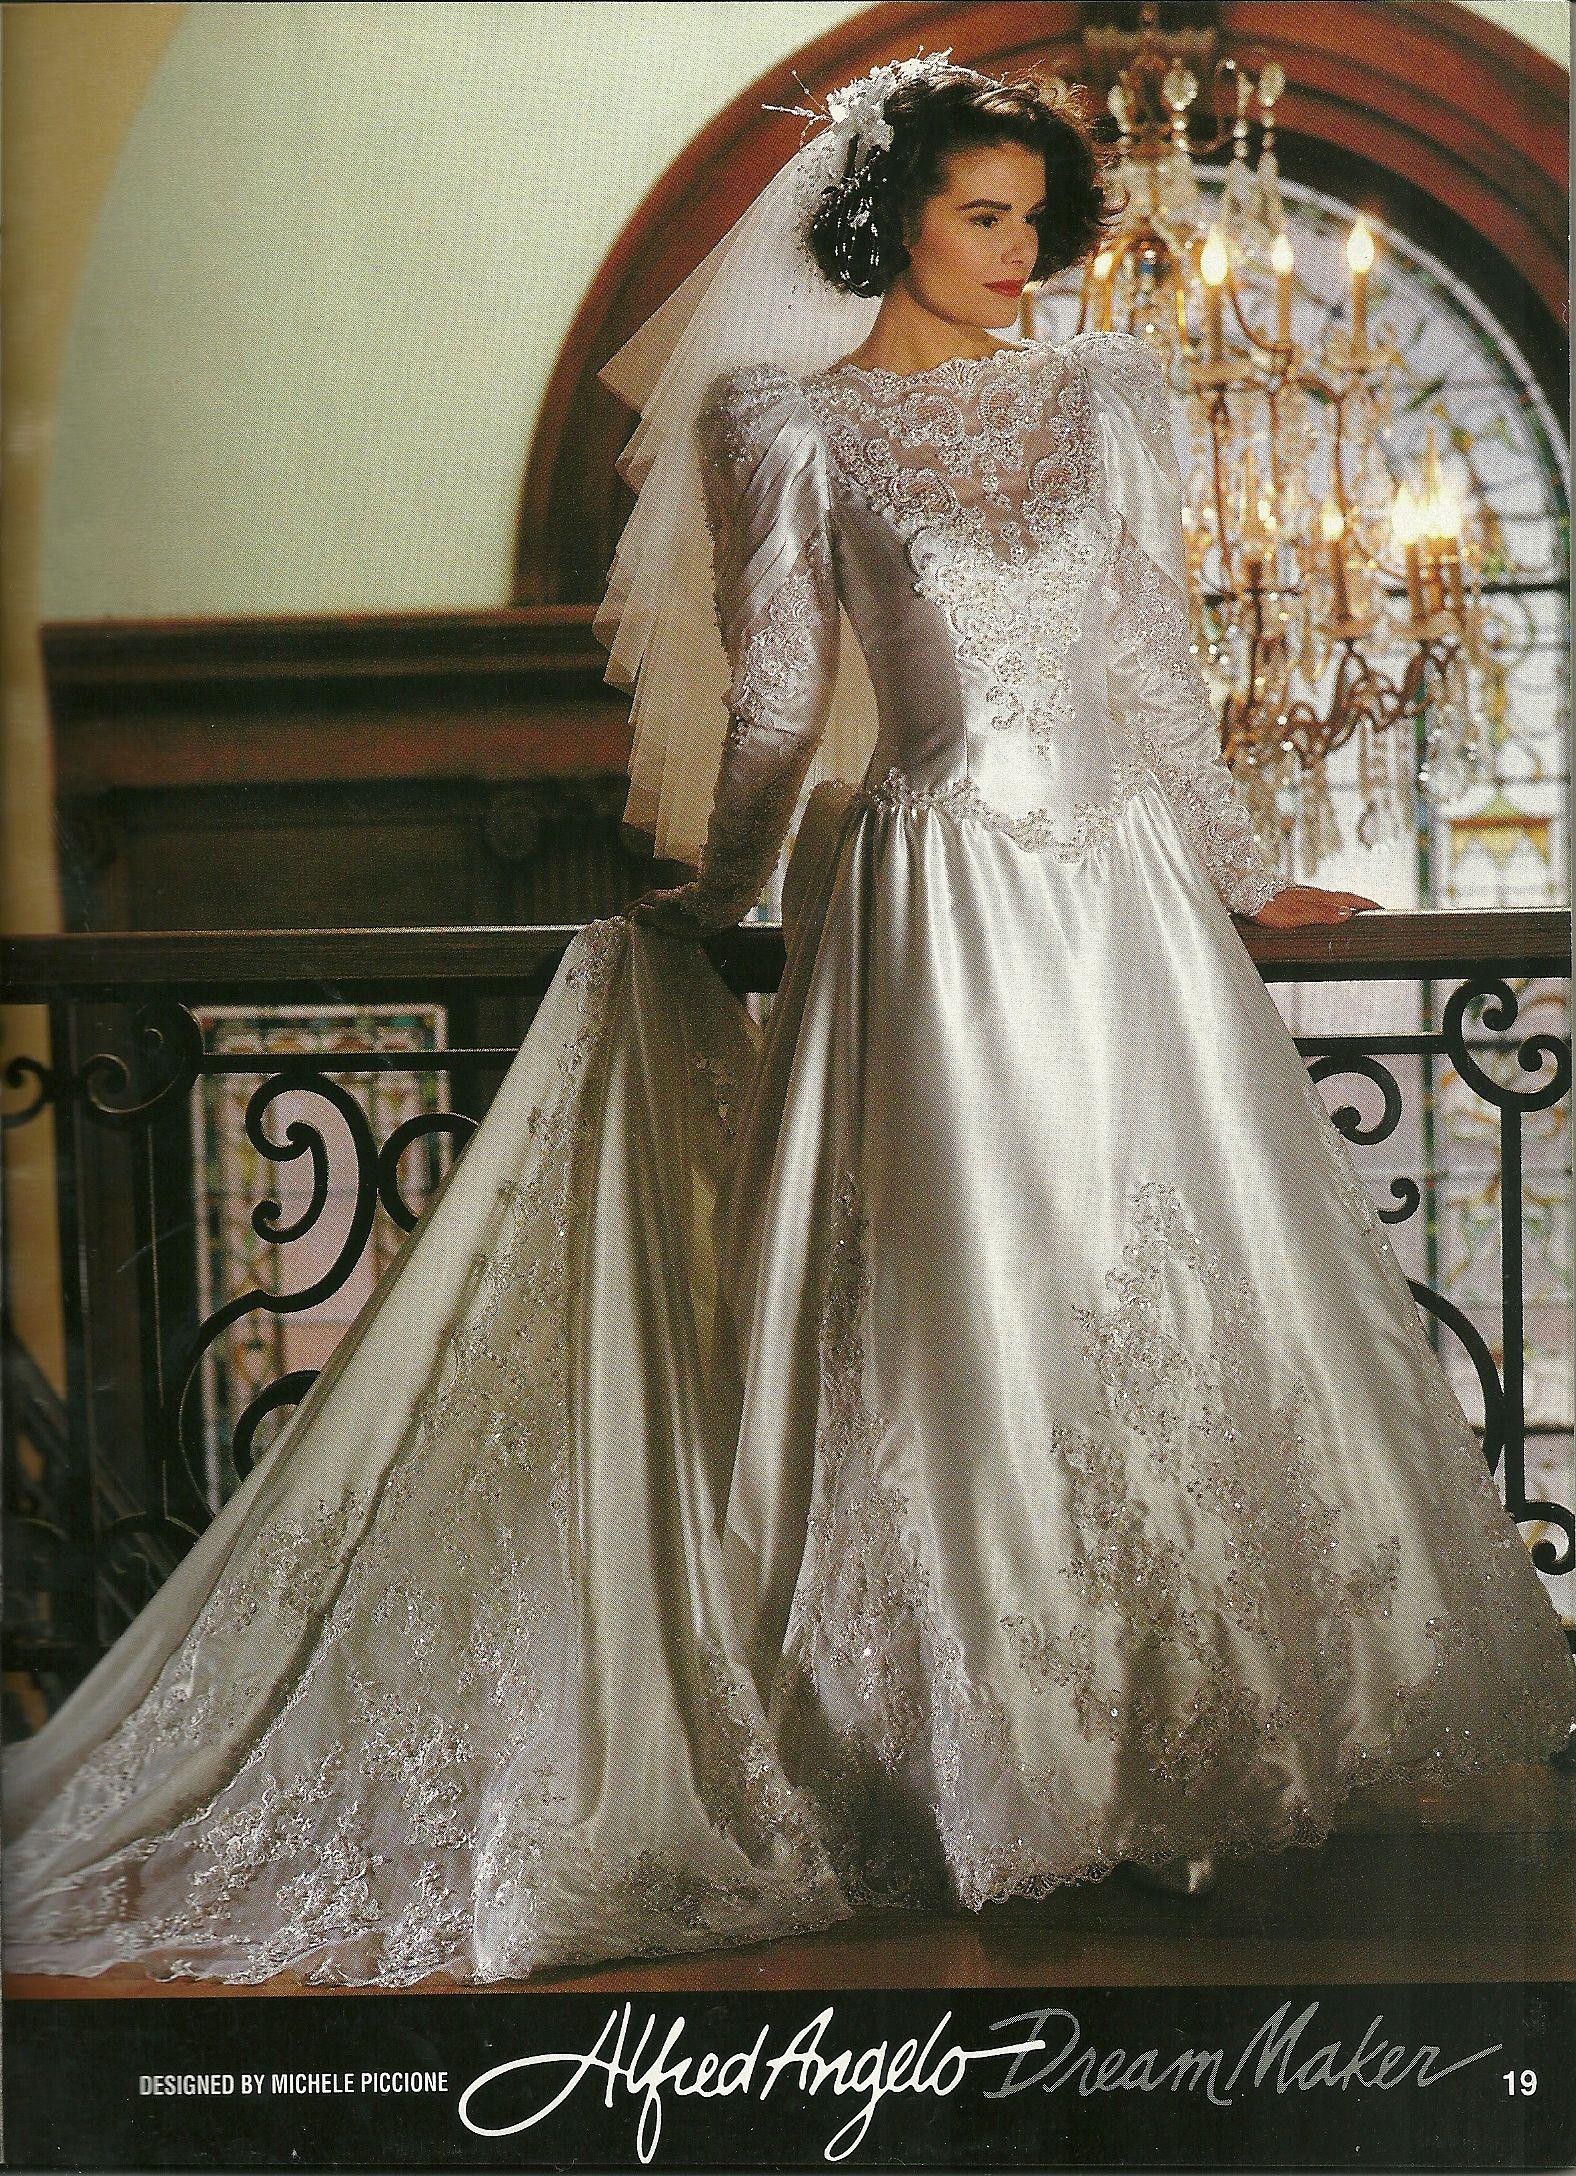 Alfred Angelo Dream Maker Spring of 1992 | 1990's wedding ...